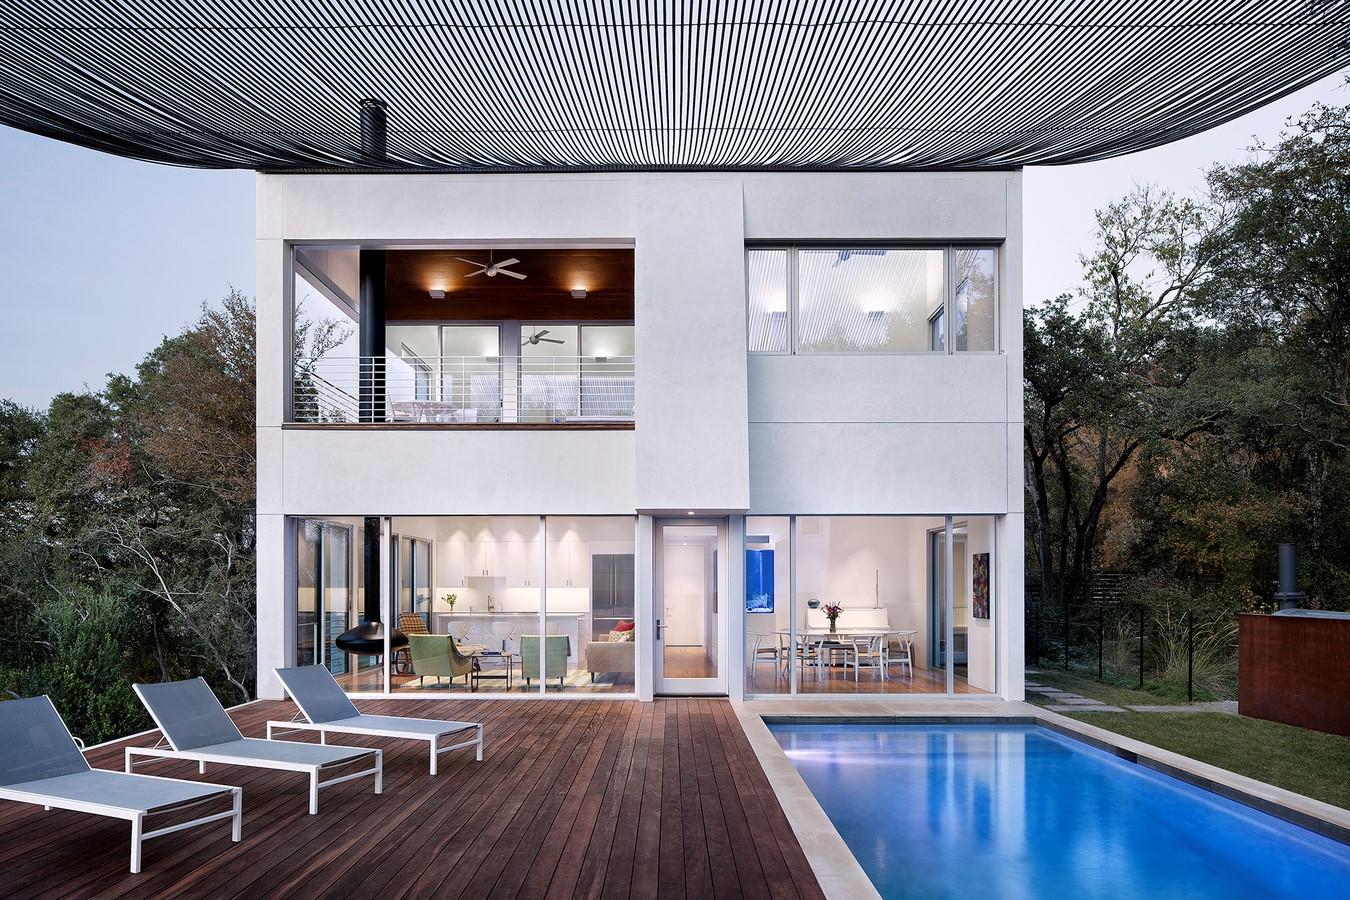 Westridge Residence by Miró Rivera Architects - Sheet1